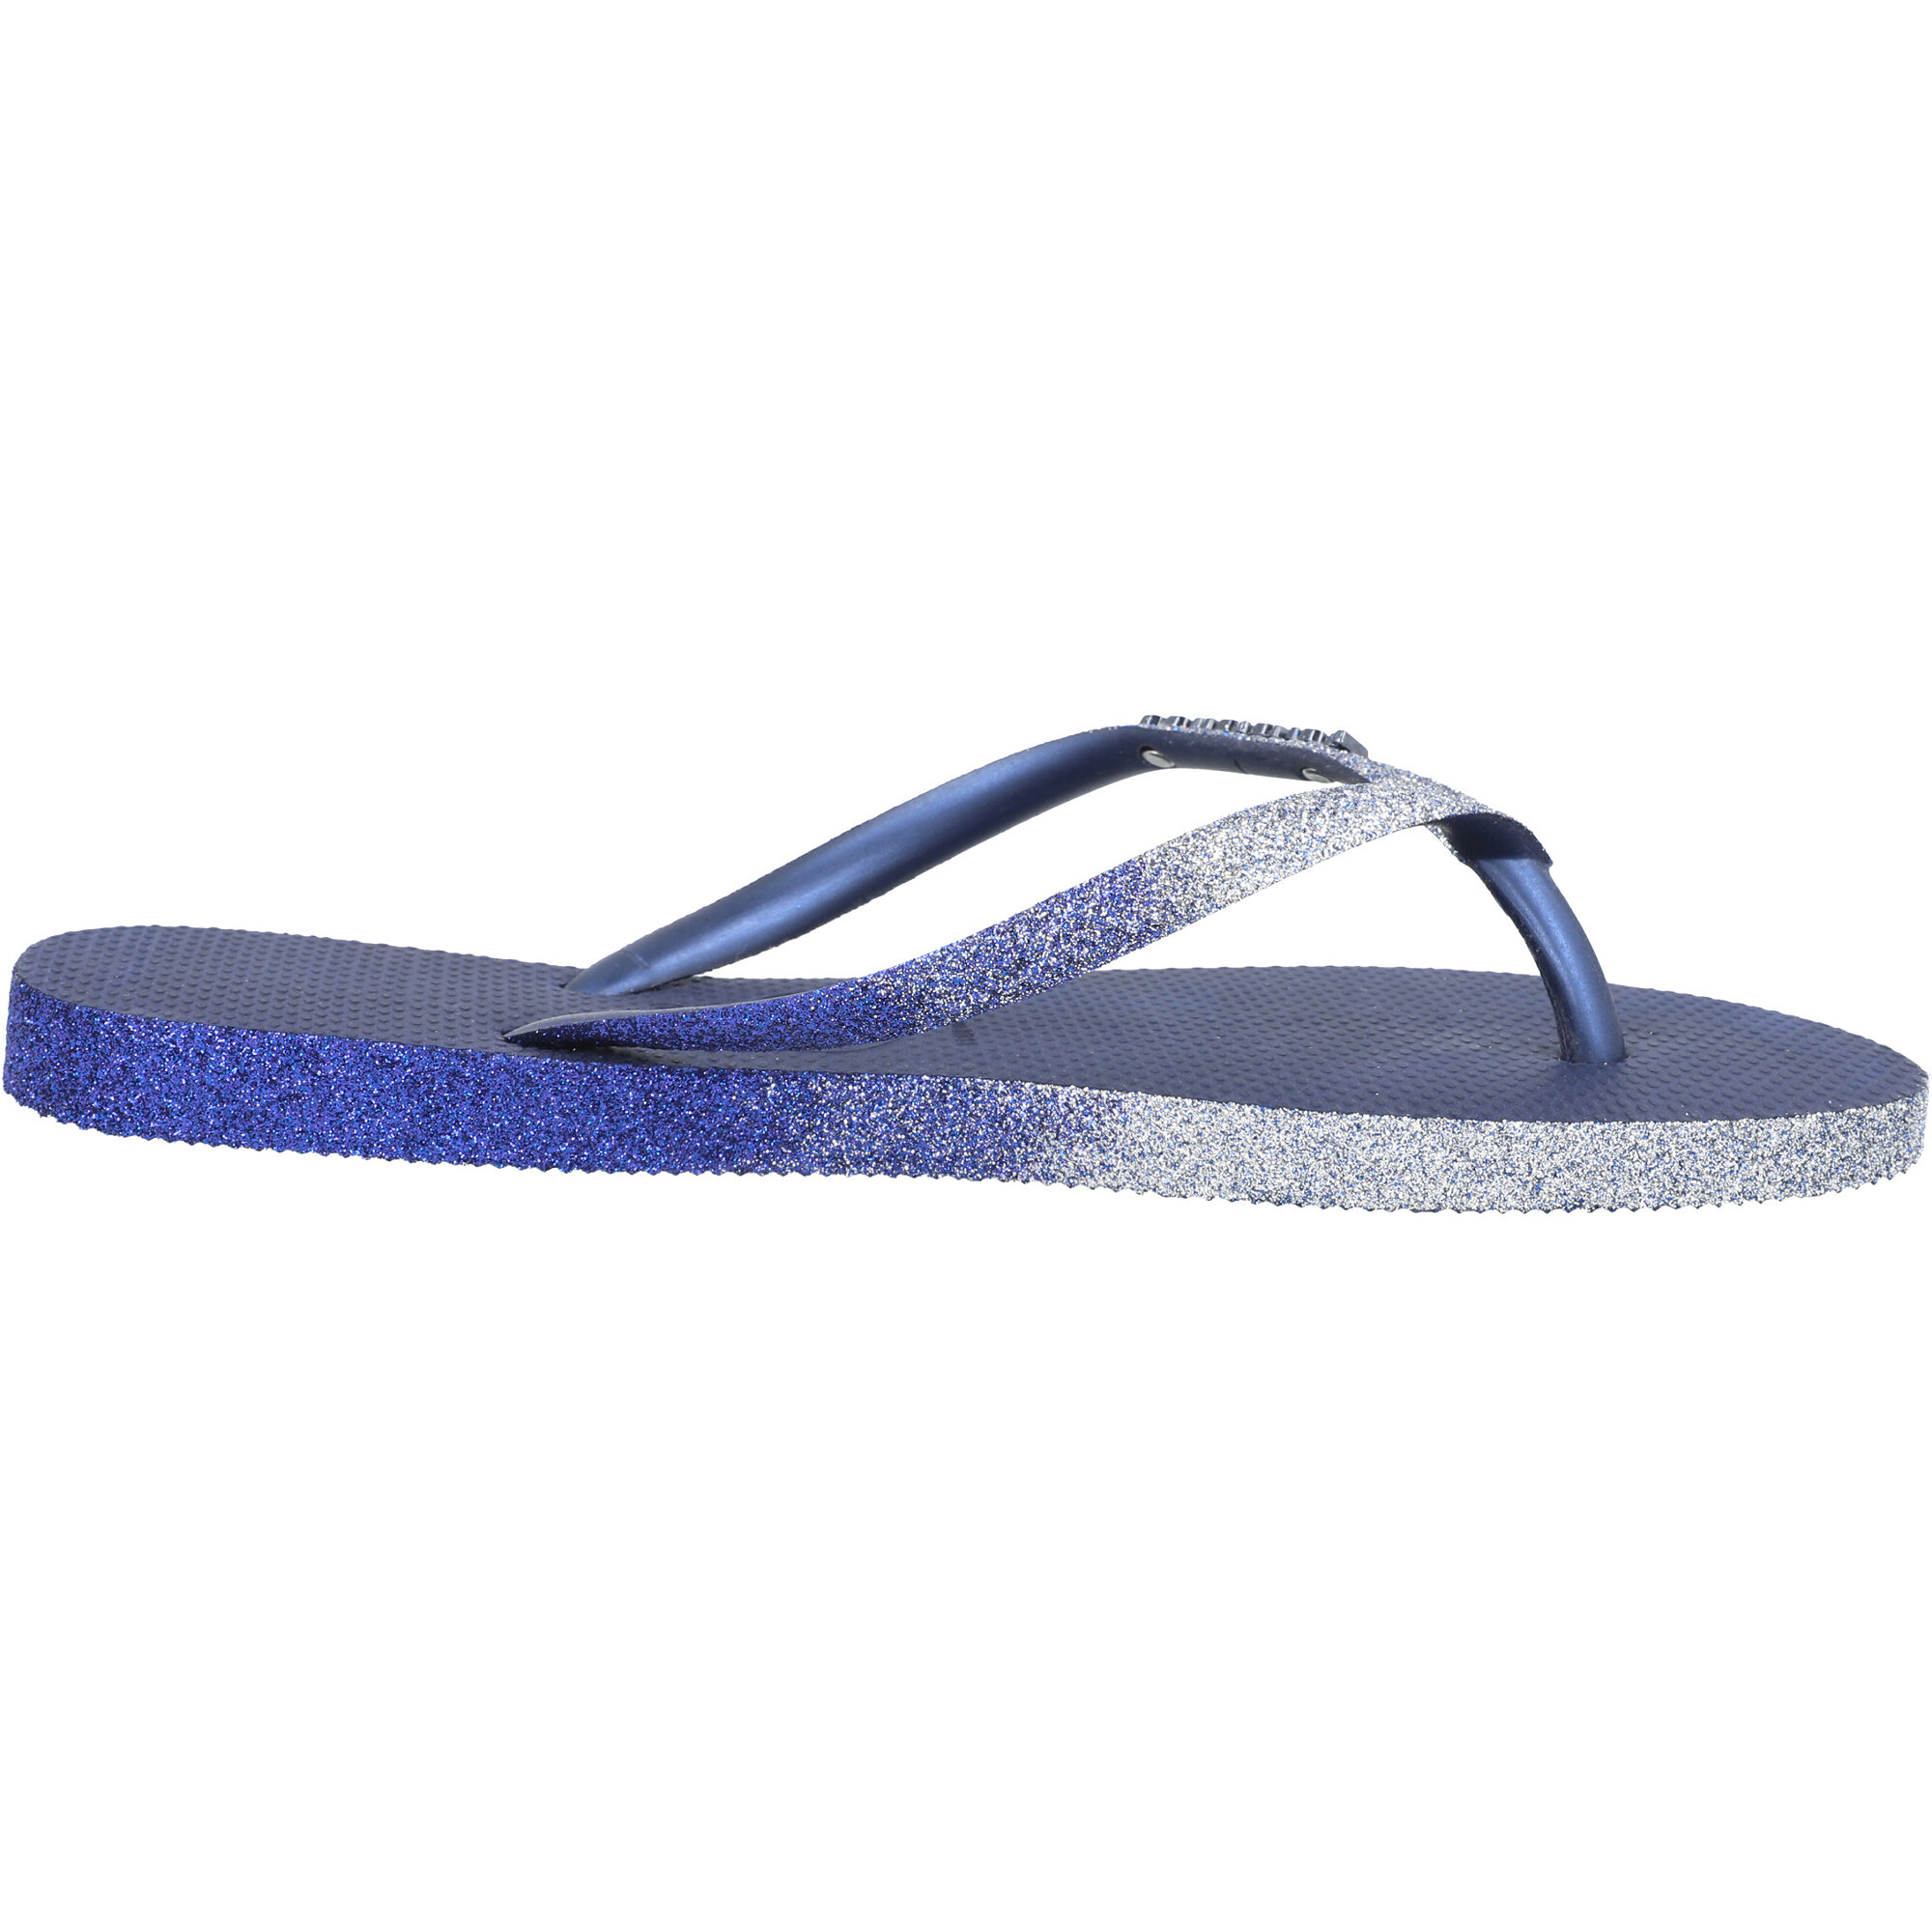 Havaianas Slim Sparkle II Navy Blue Rubber